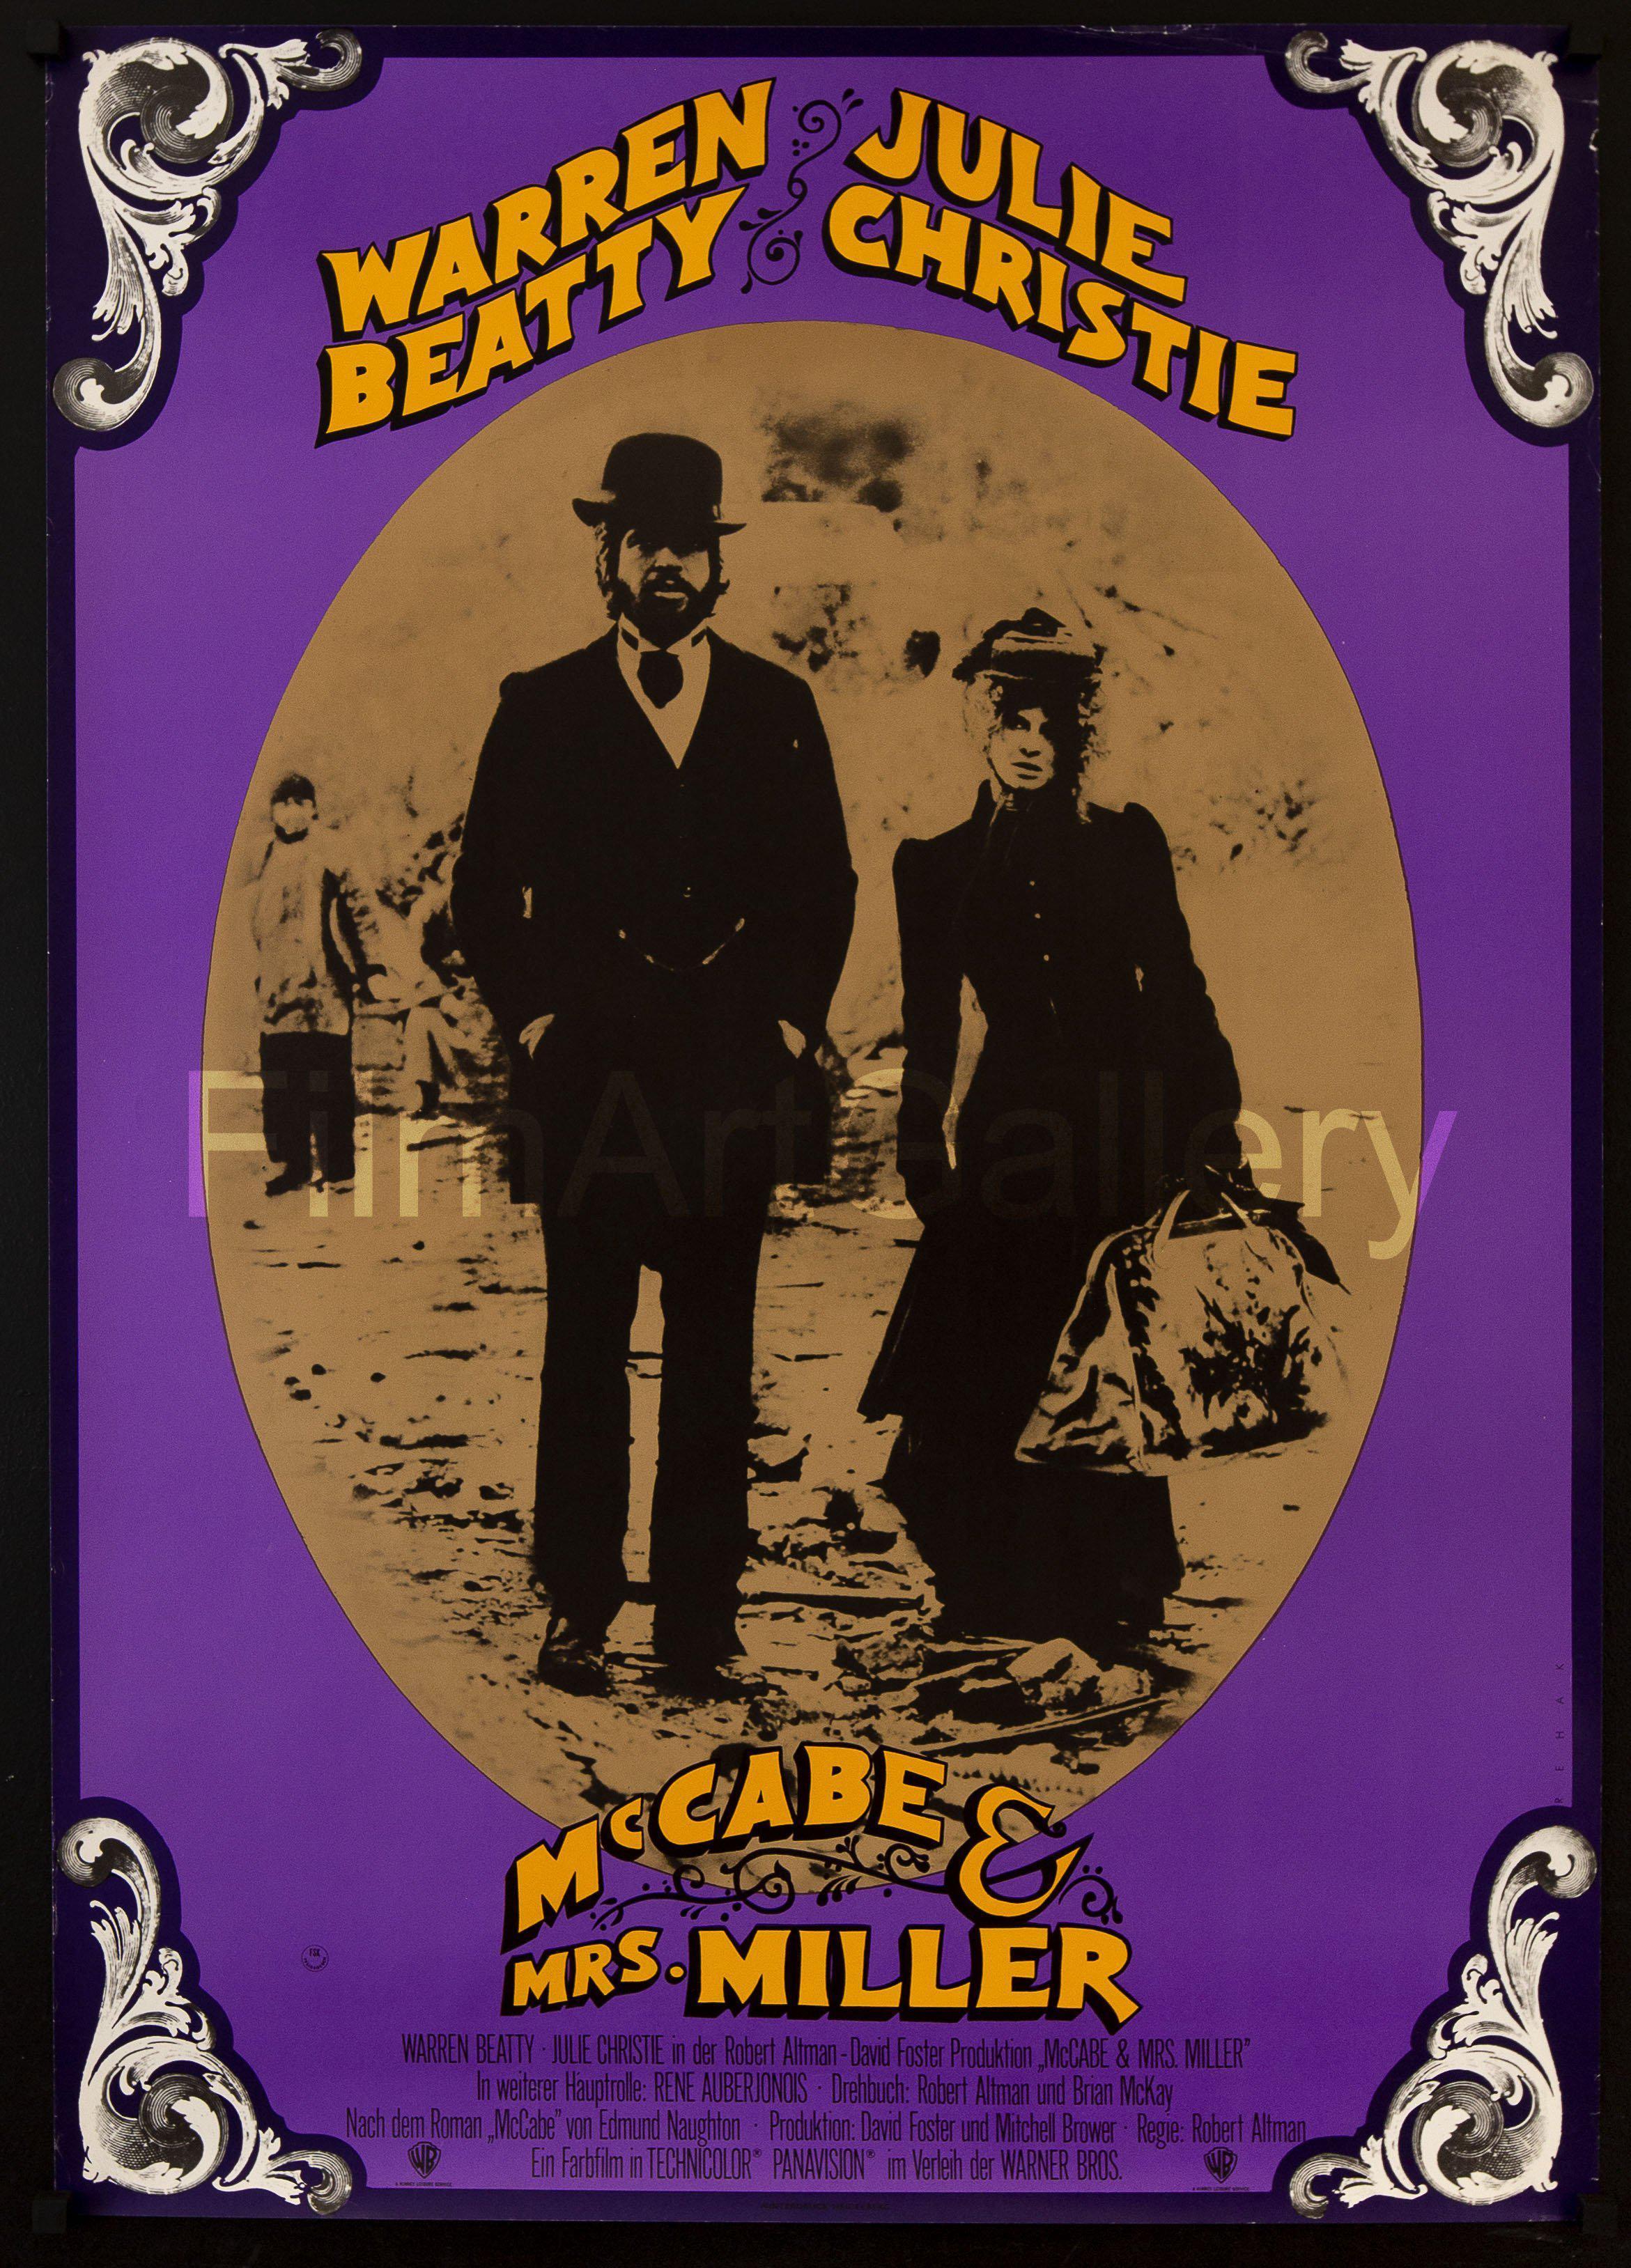 McCabe & Mrs. Miller (1971) Main Poster